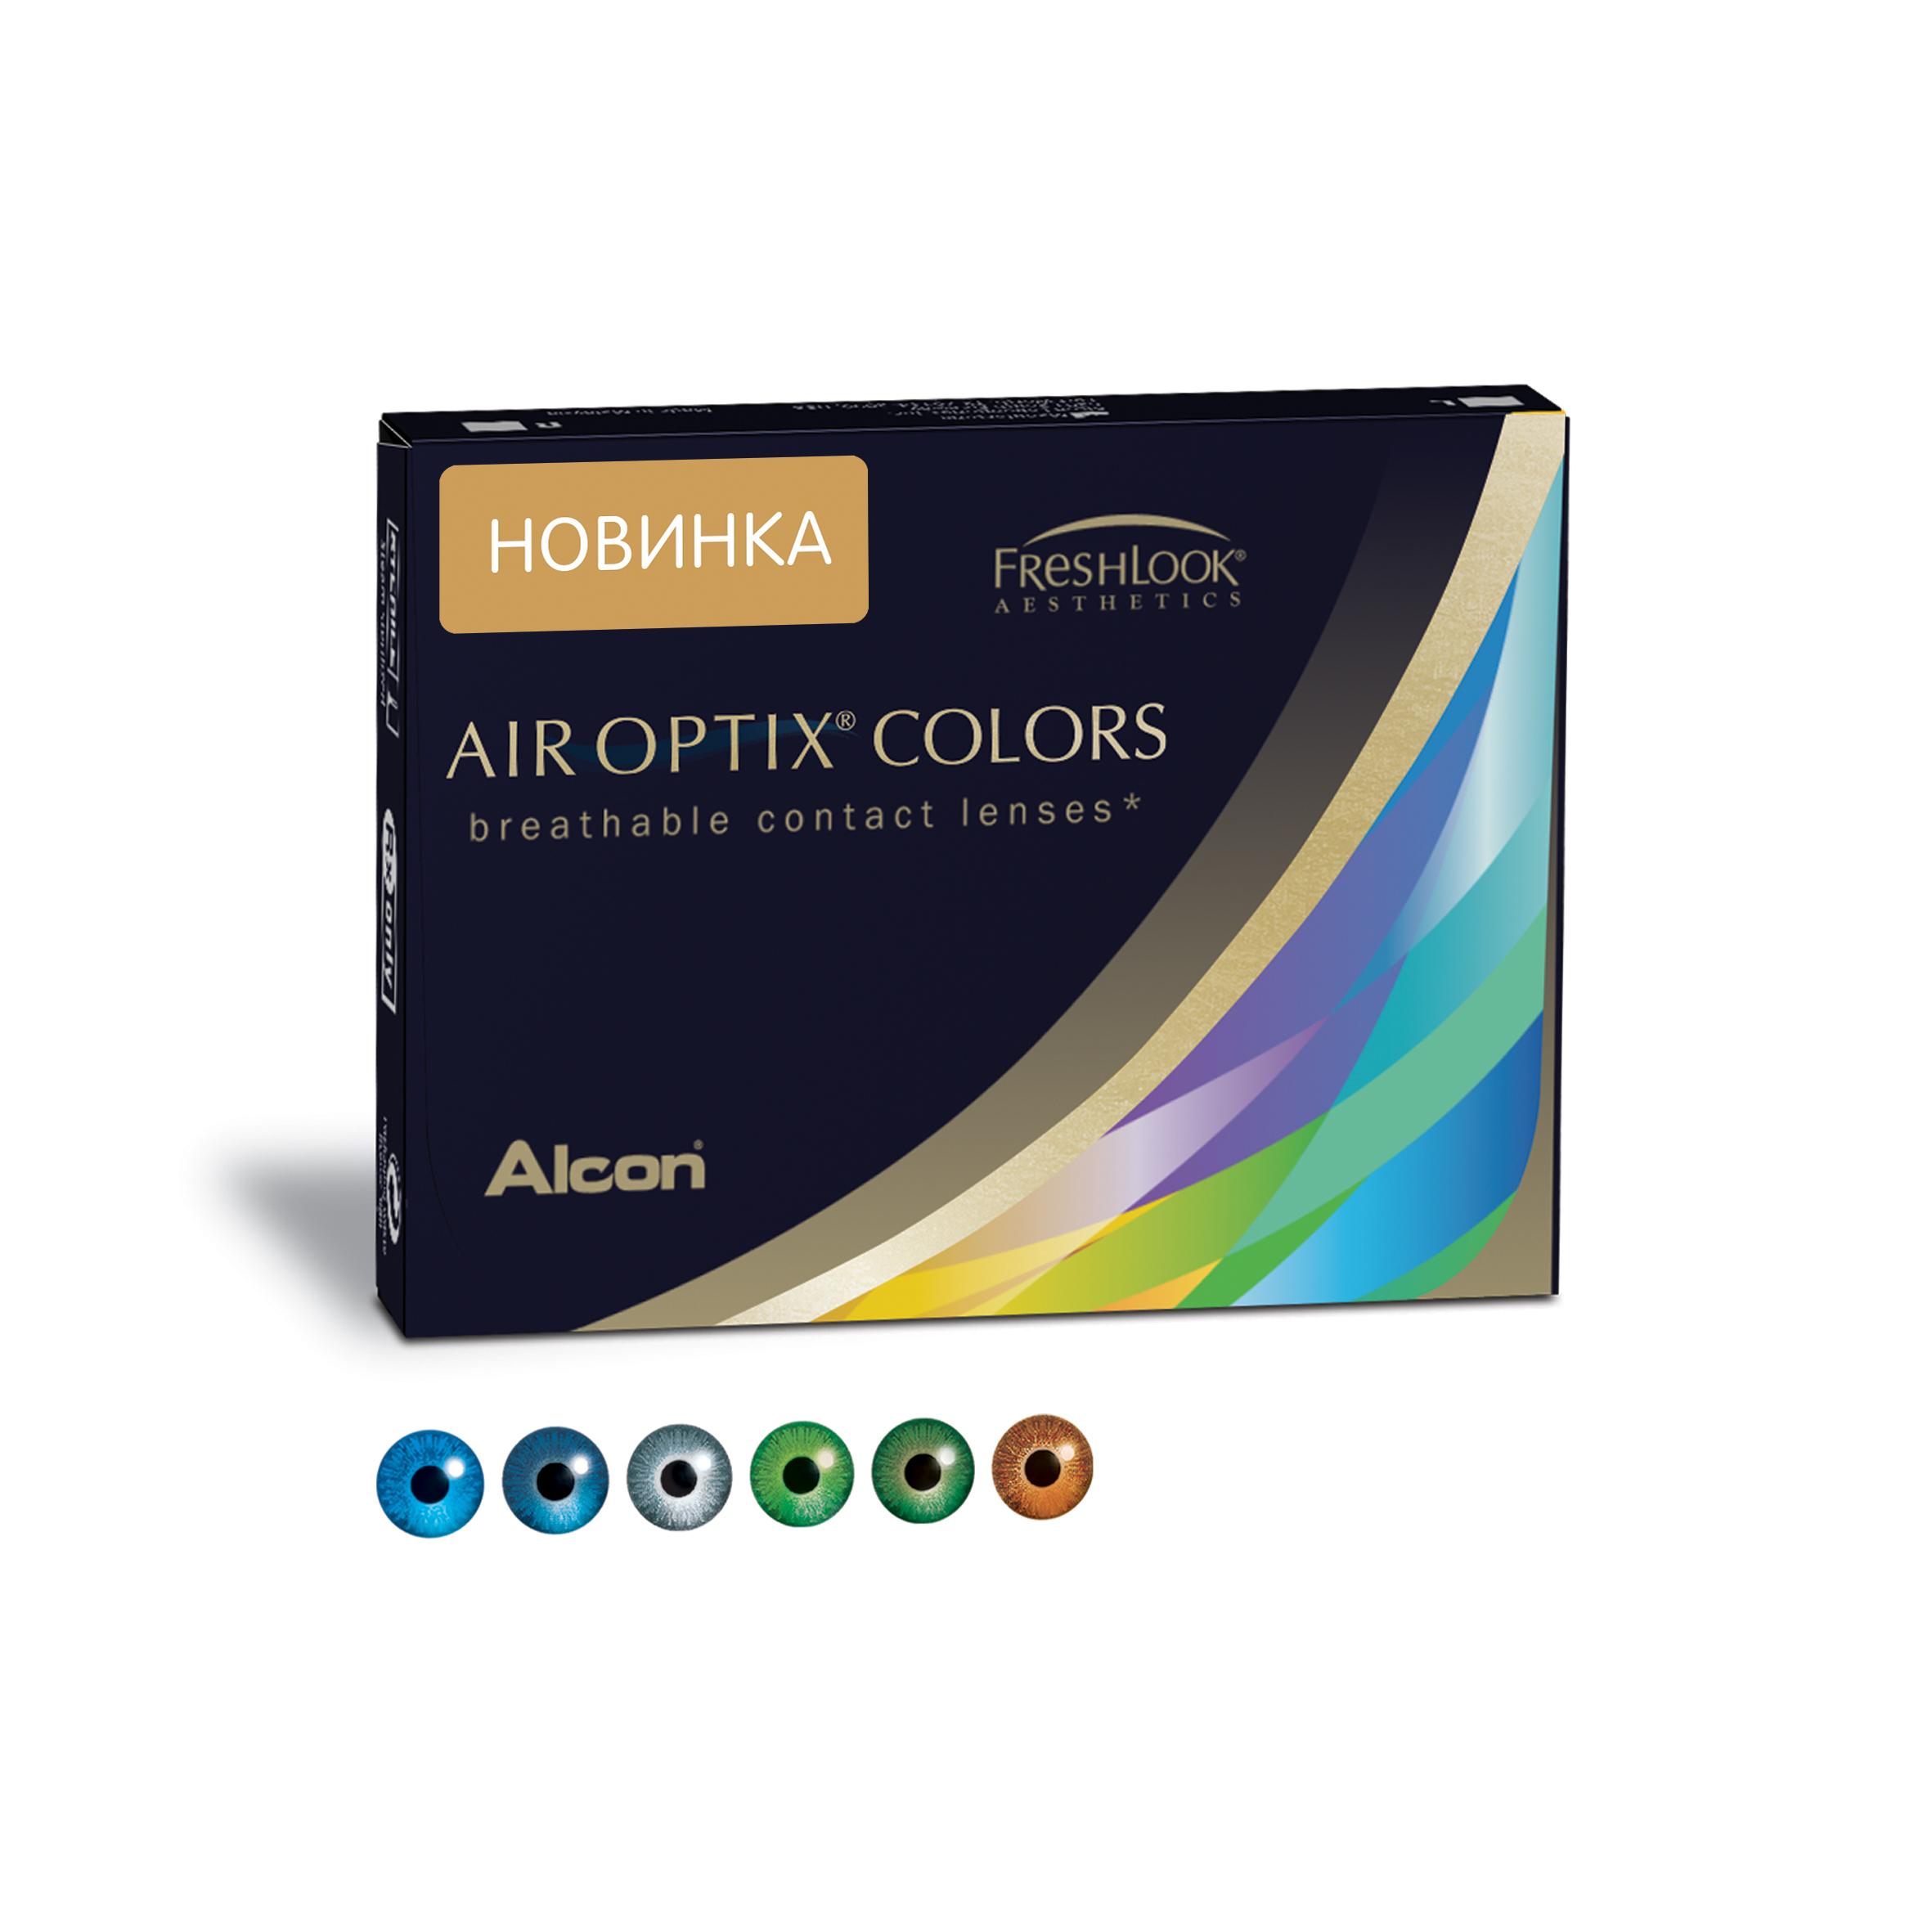 Аlcon контактные линзы Air Optix Colors 2 шт -5.50 Blue ( 31746283 )